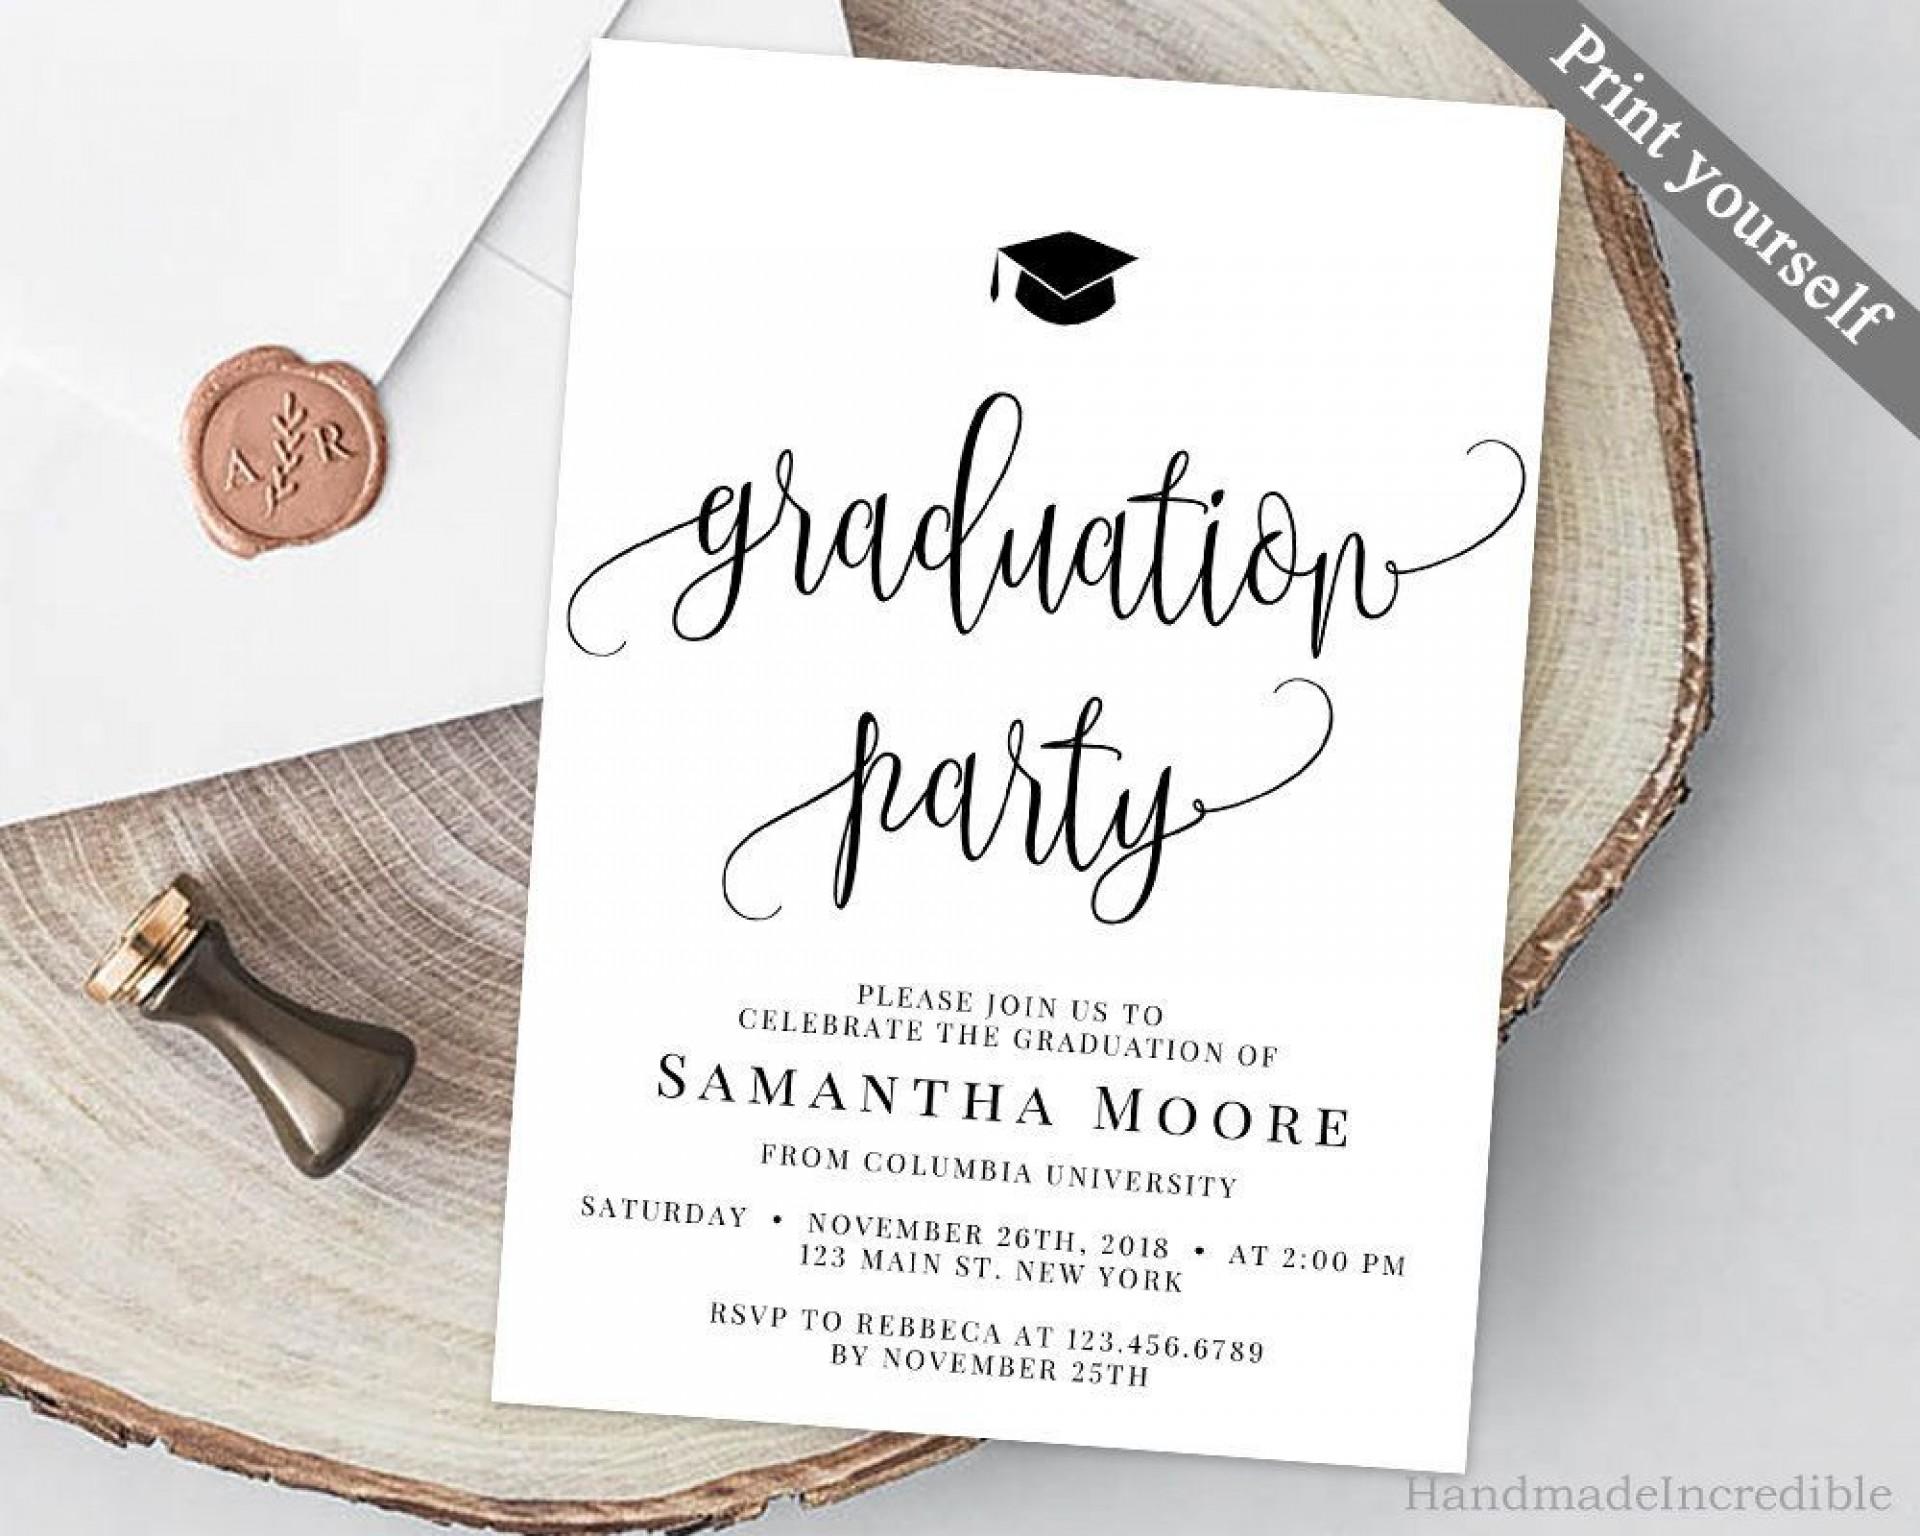 007 Stupendou College Graduation Party Invitation Template Inspiration  Templates1920